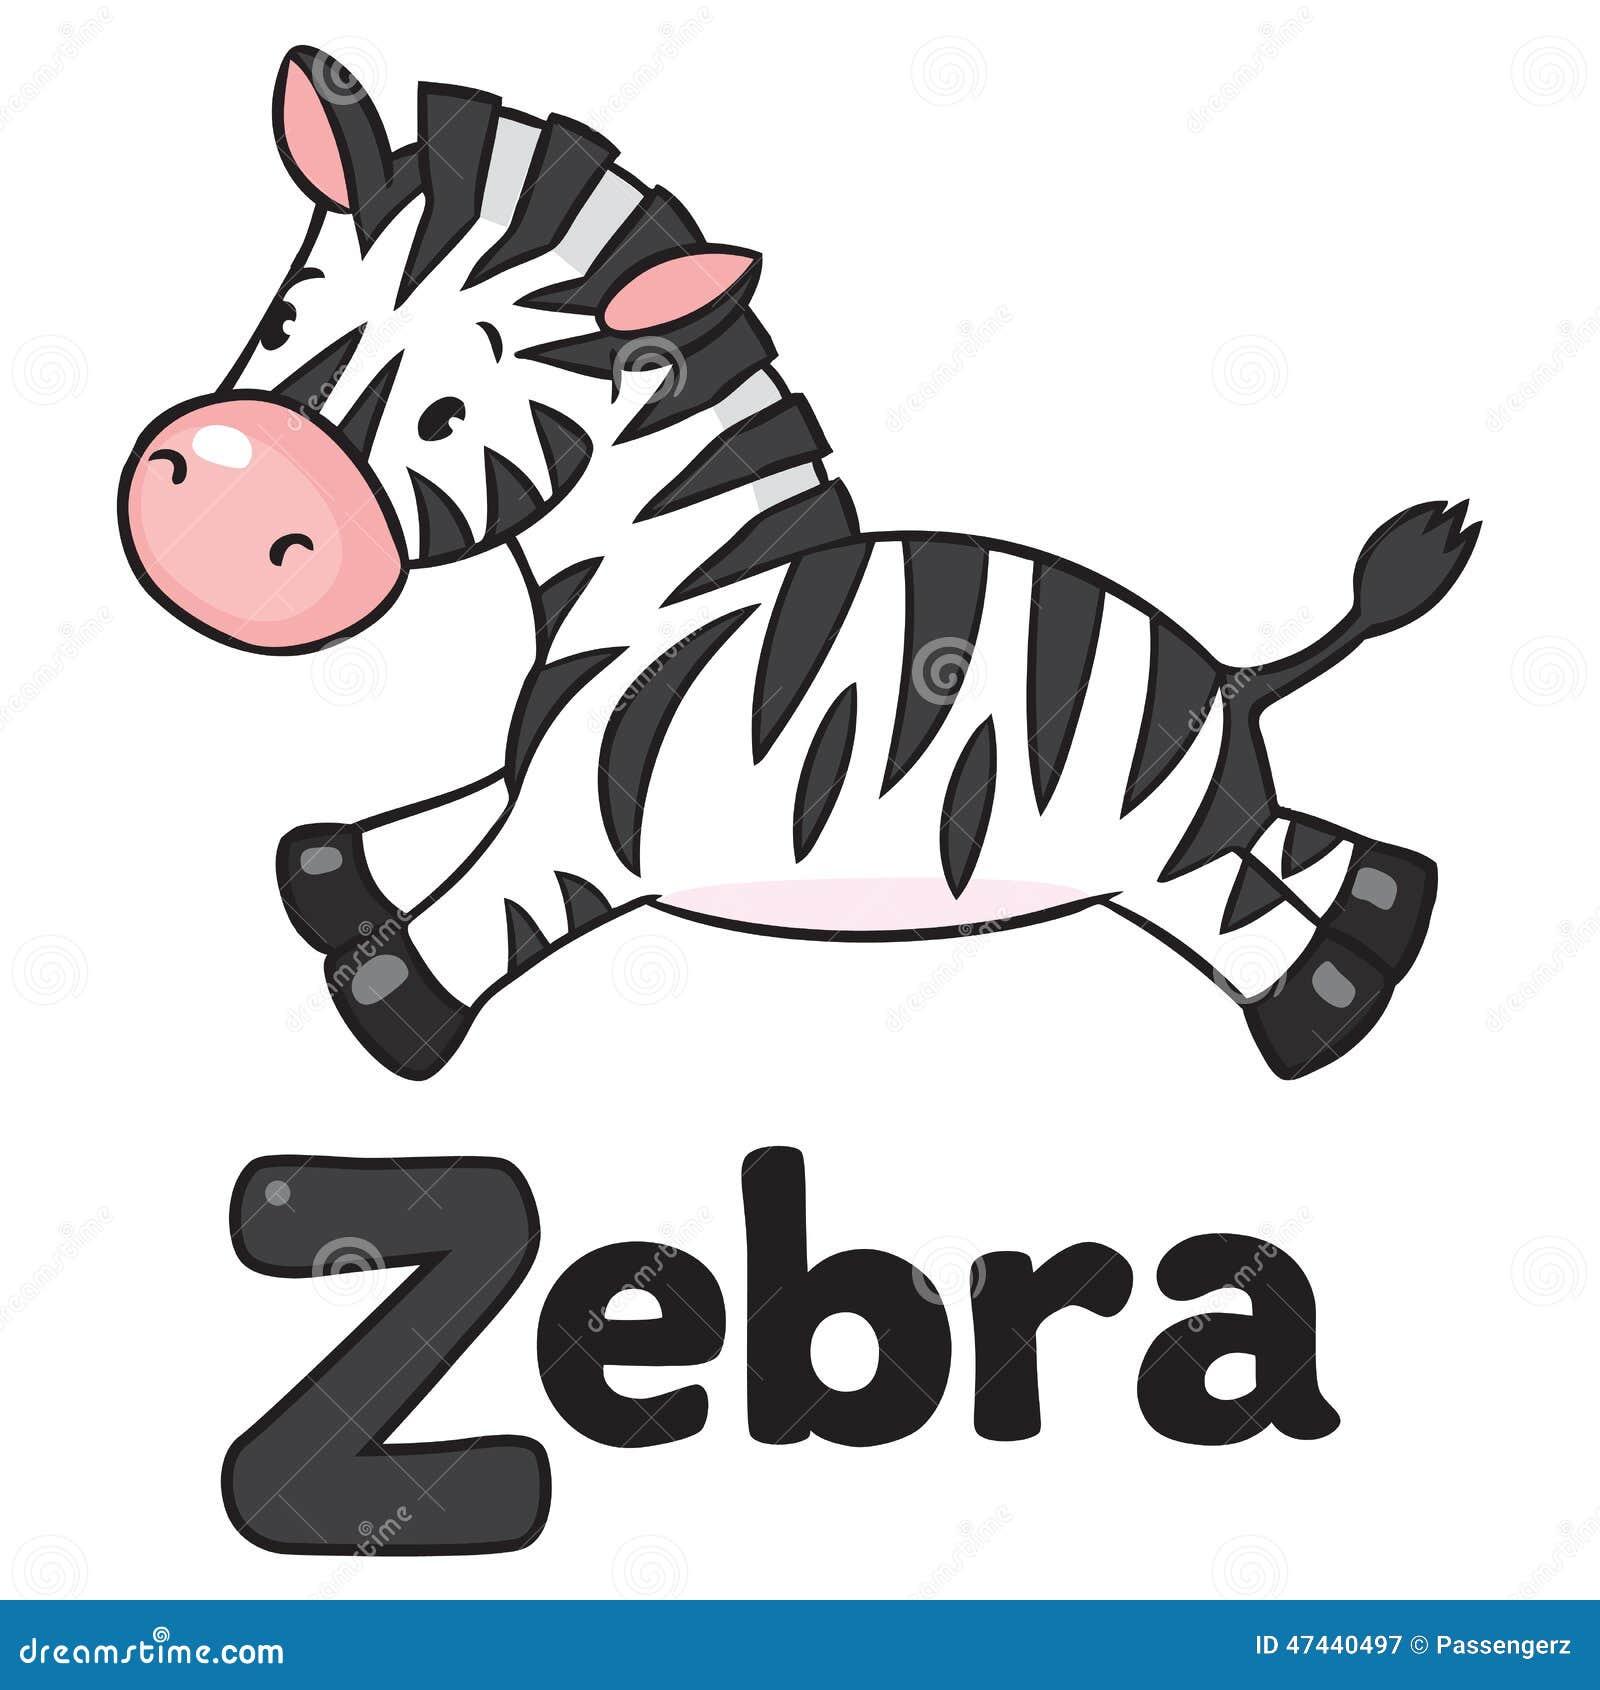 Stock Illustration Little Zebra Abc Alphabet Z Children Vector Illustration Funny Runs Savannah Image47440497 on Letter U Video Download